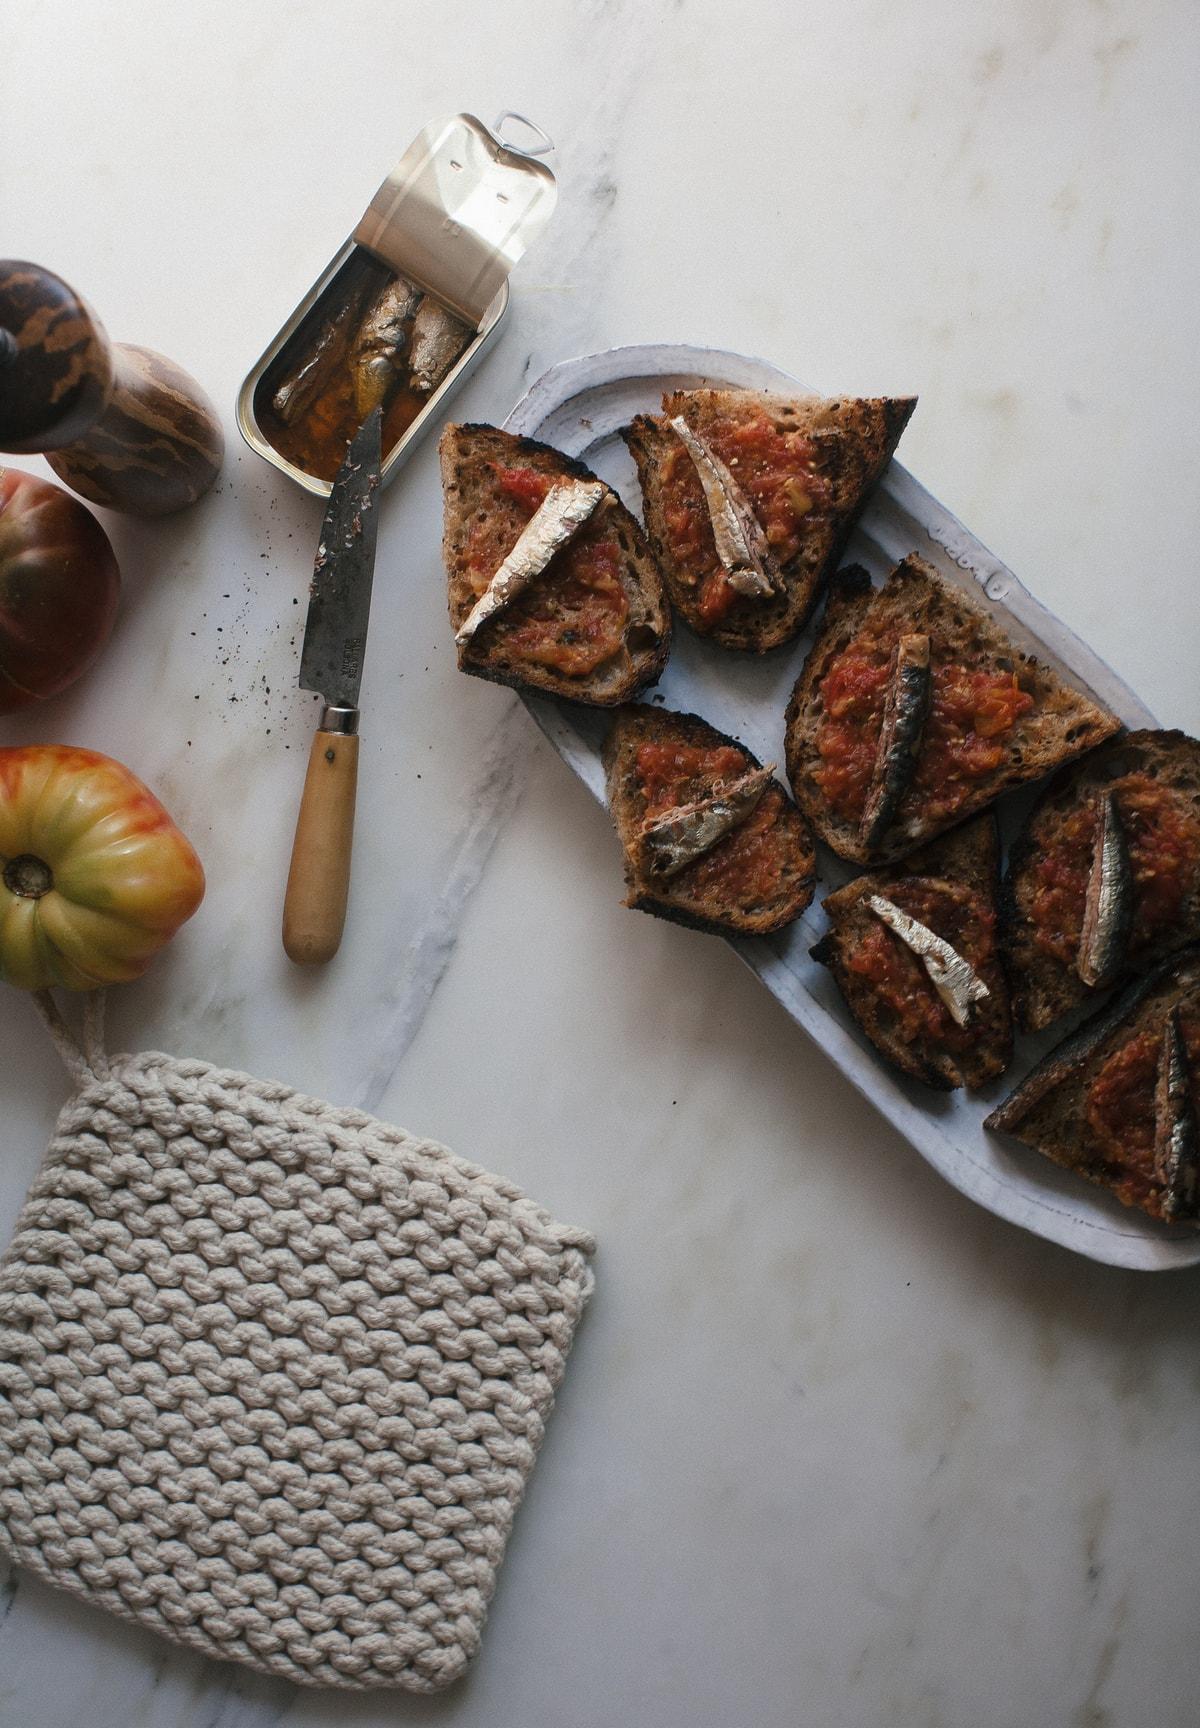 Heirloom Pan Con Tomate